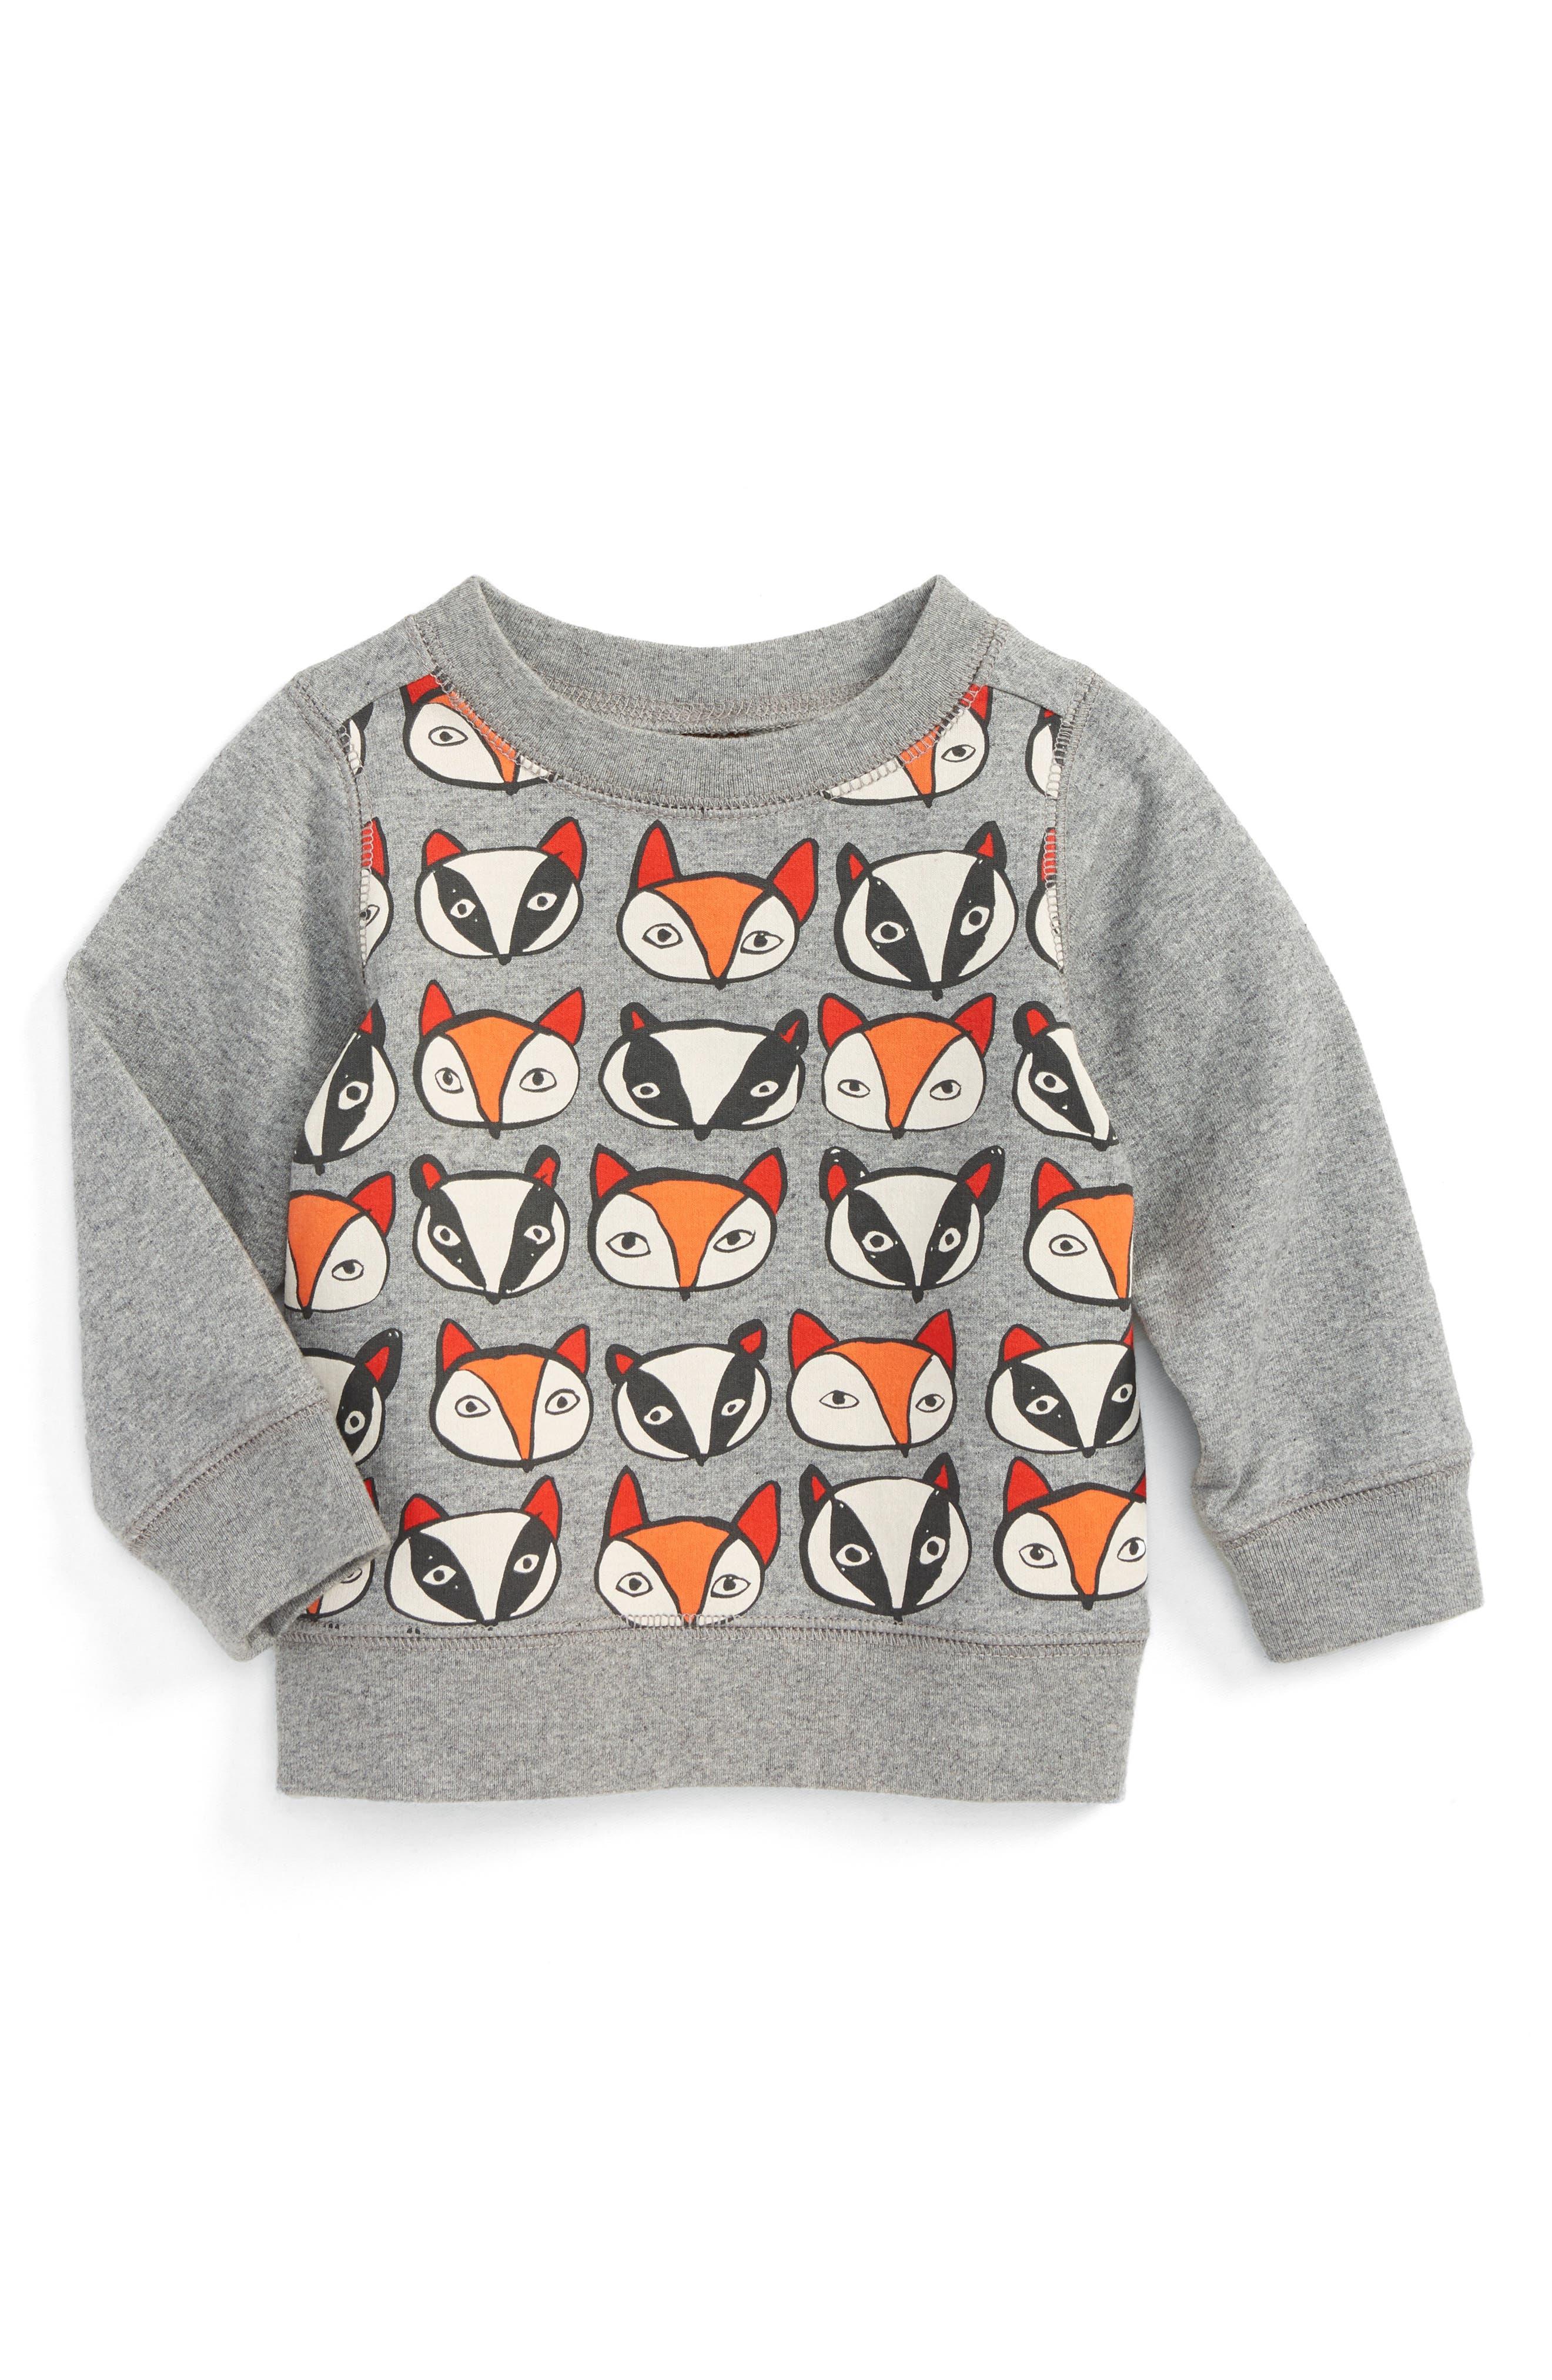 Fox & Badger Print Sweater,                             Main thumbnail 1, color,                             035